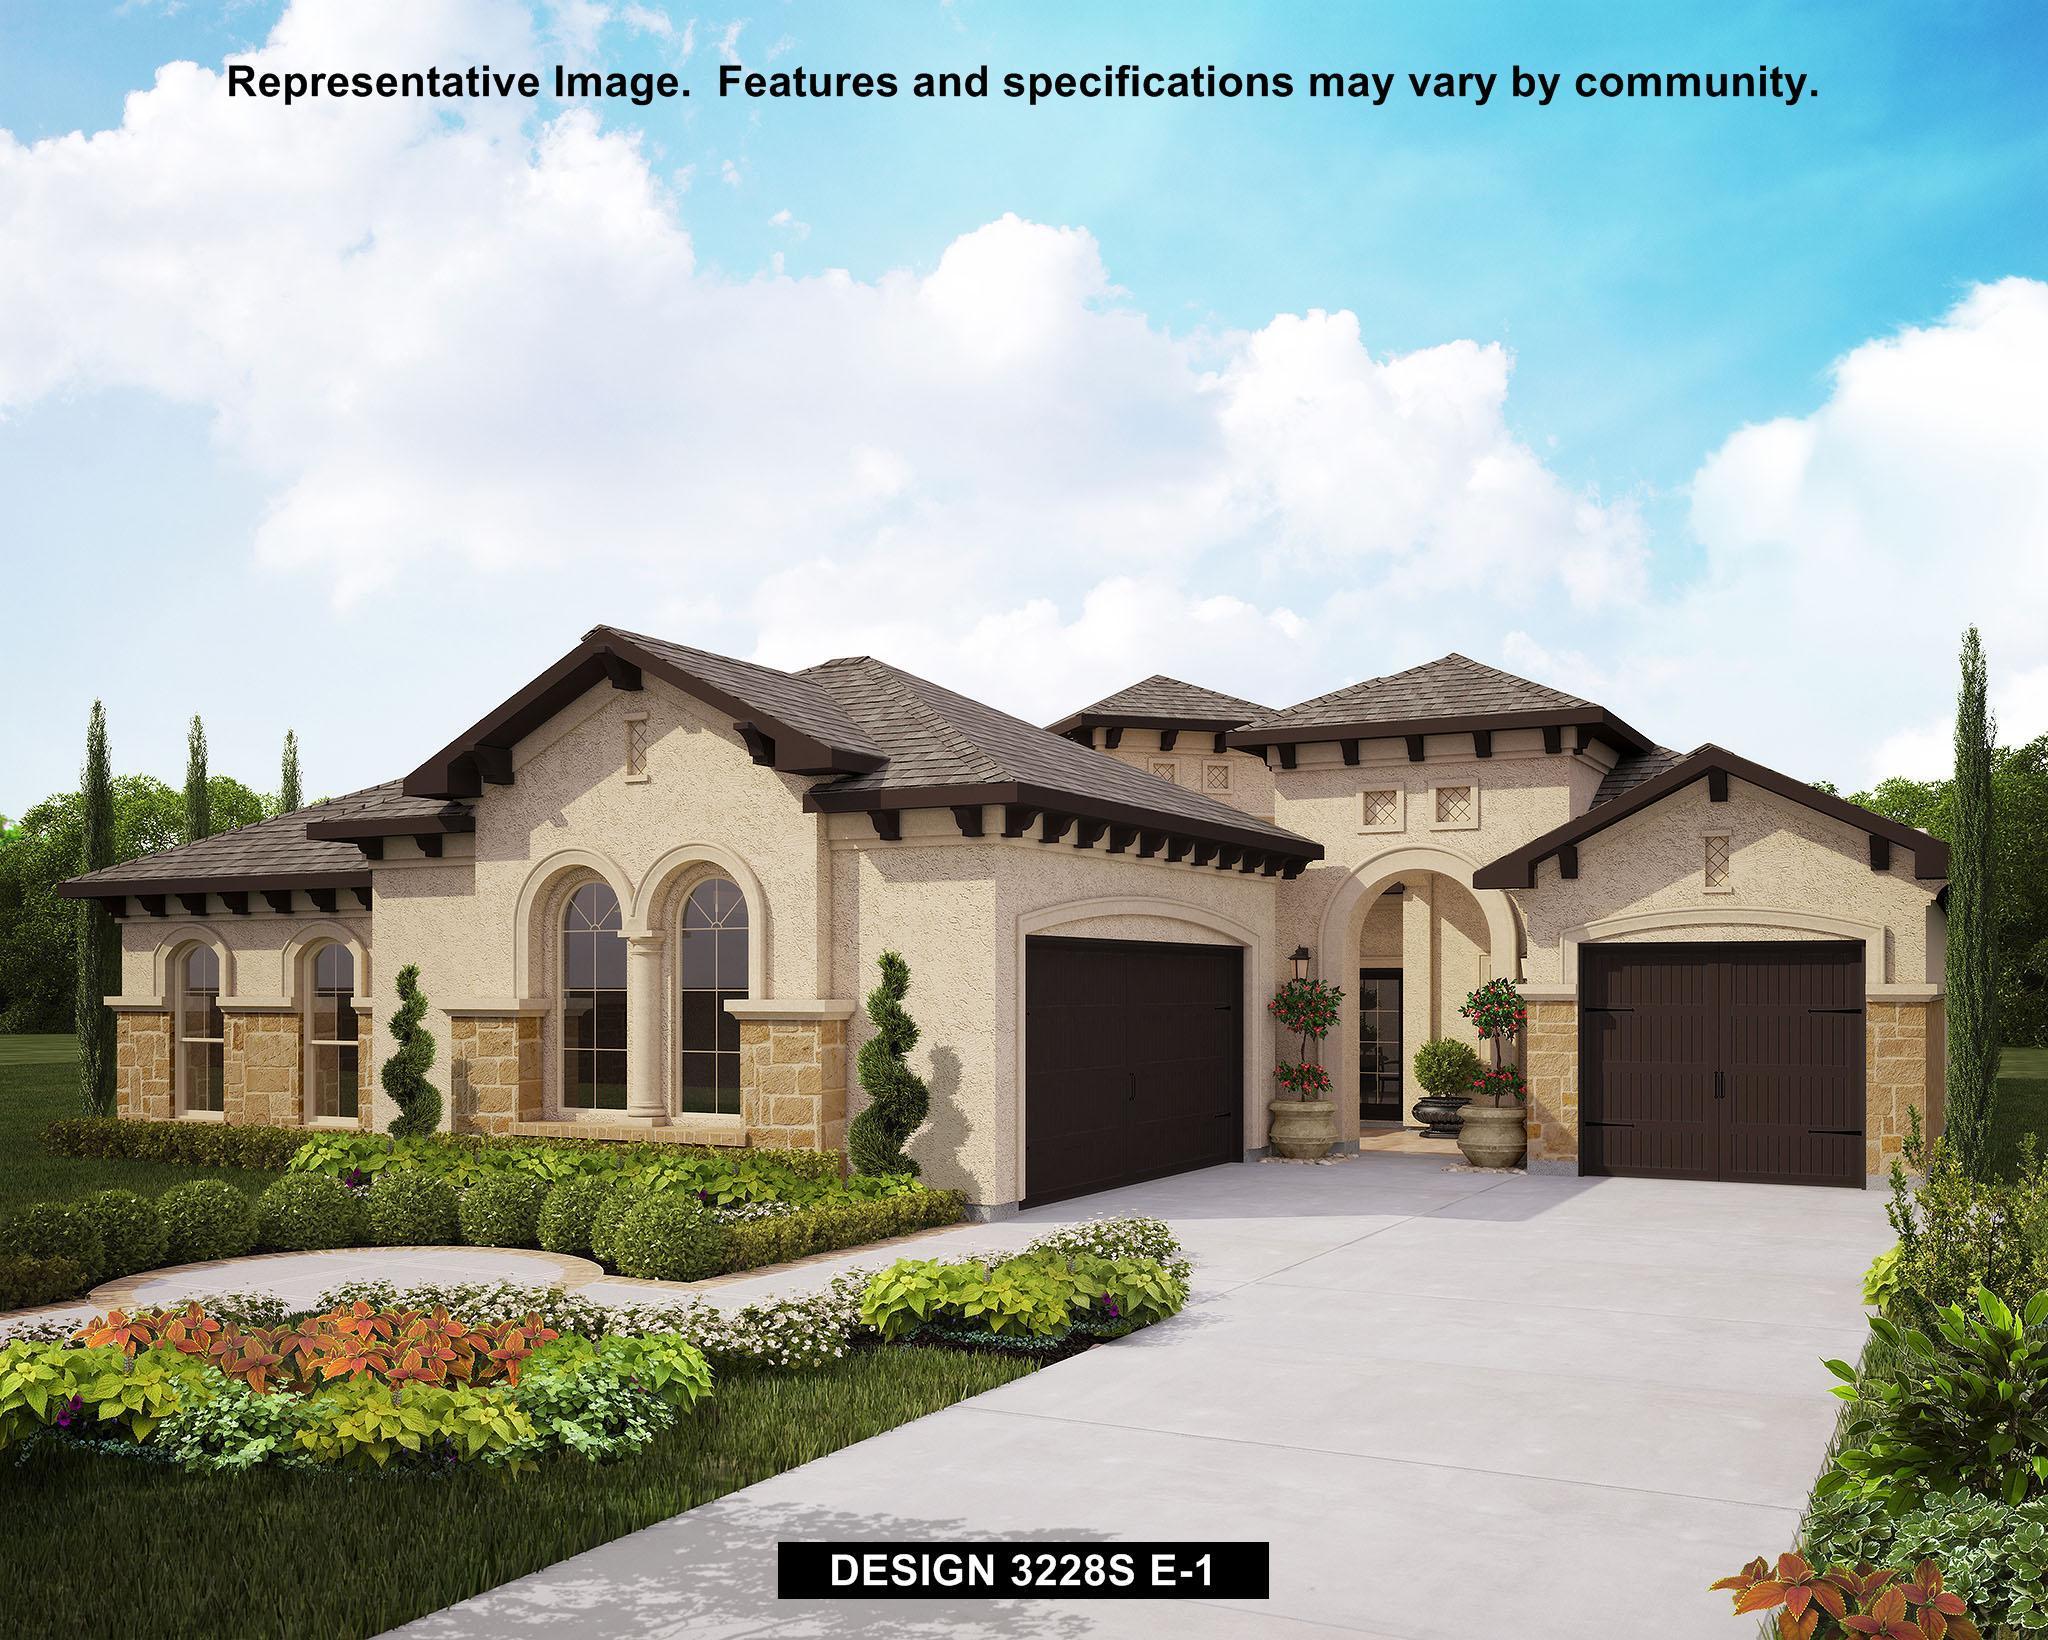 Oakwood homes design center utah perry homes design center for Oakwood homes design center